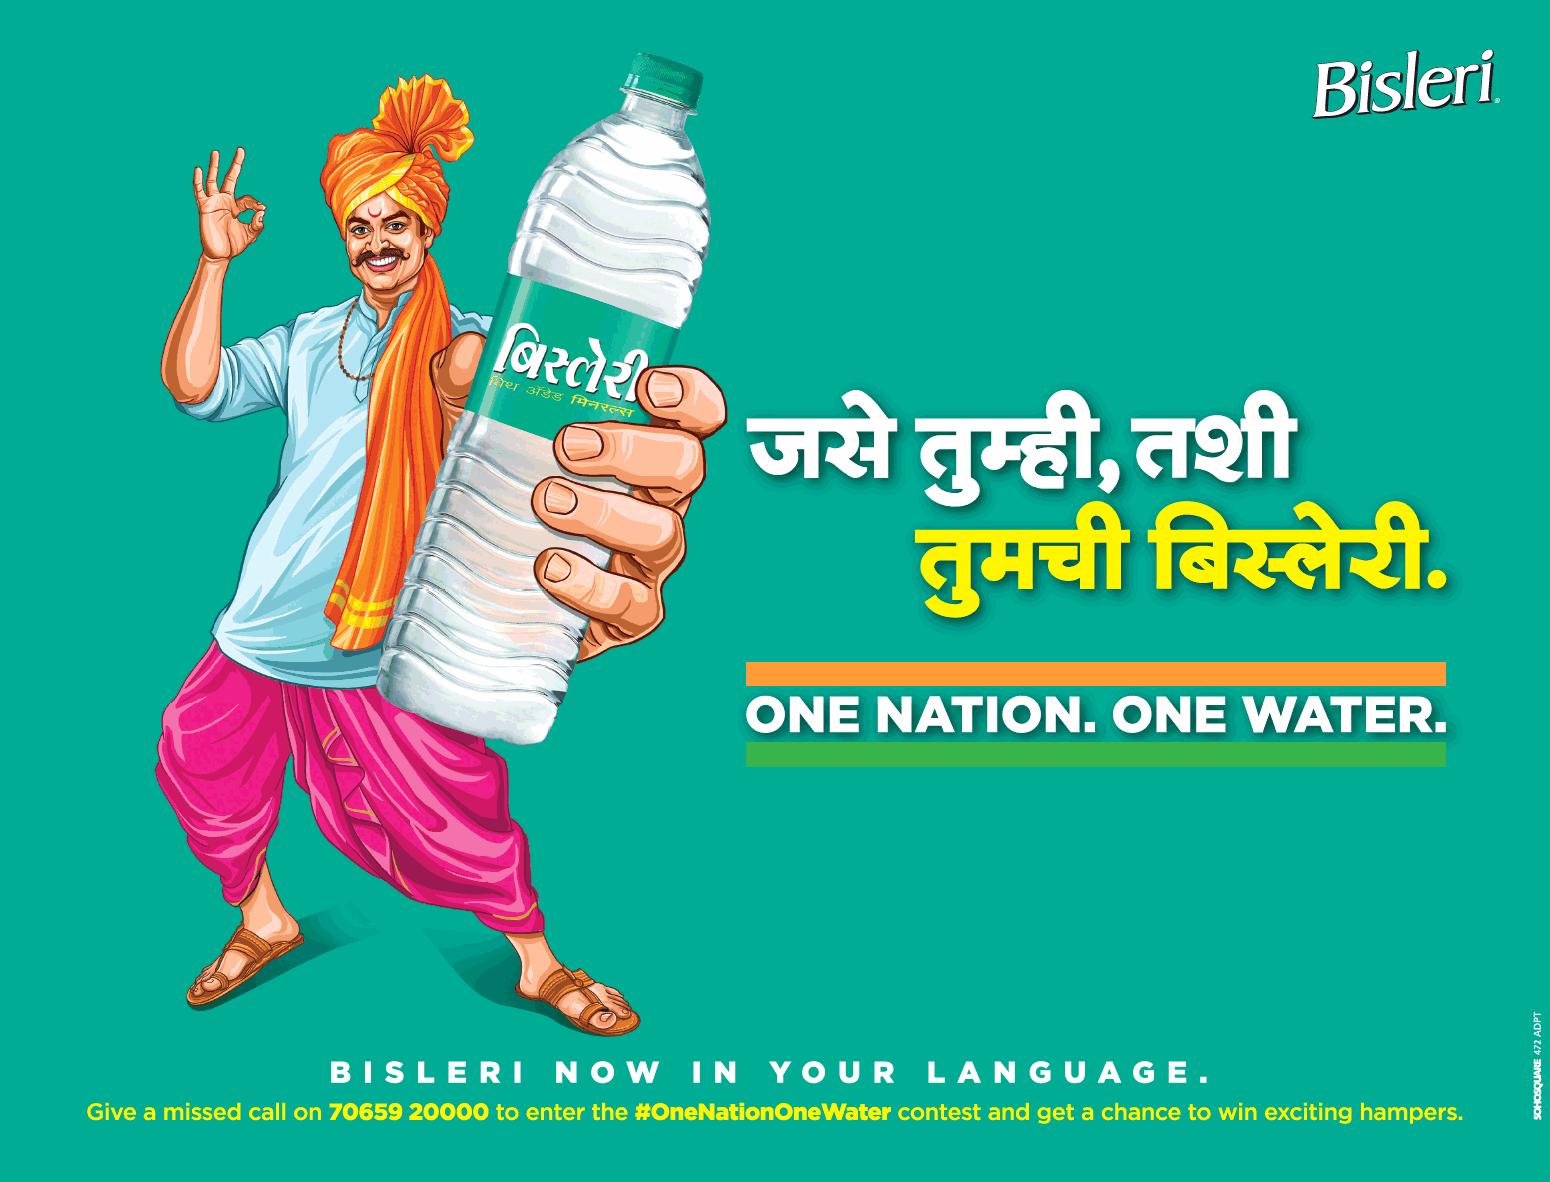 bisleri water jaise tumhi tashi tumchi bisleri nation one water ad